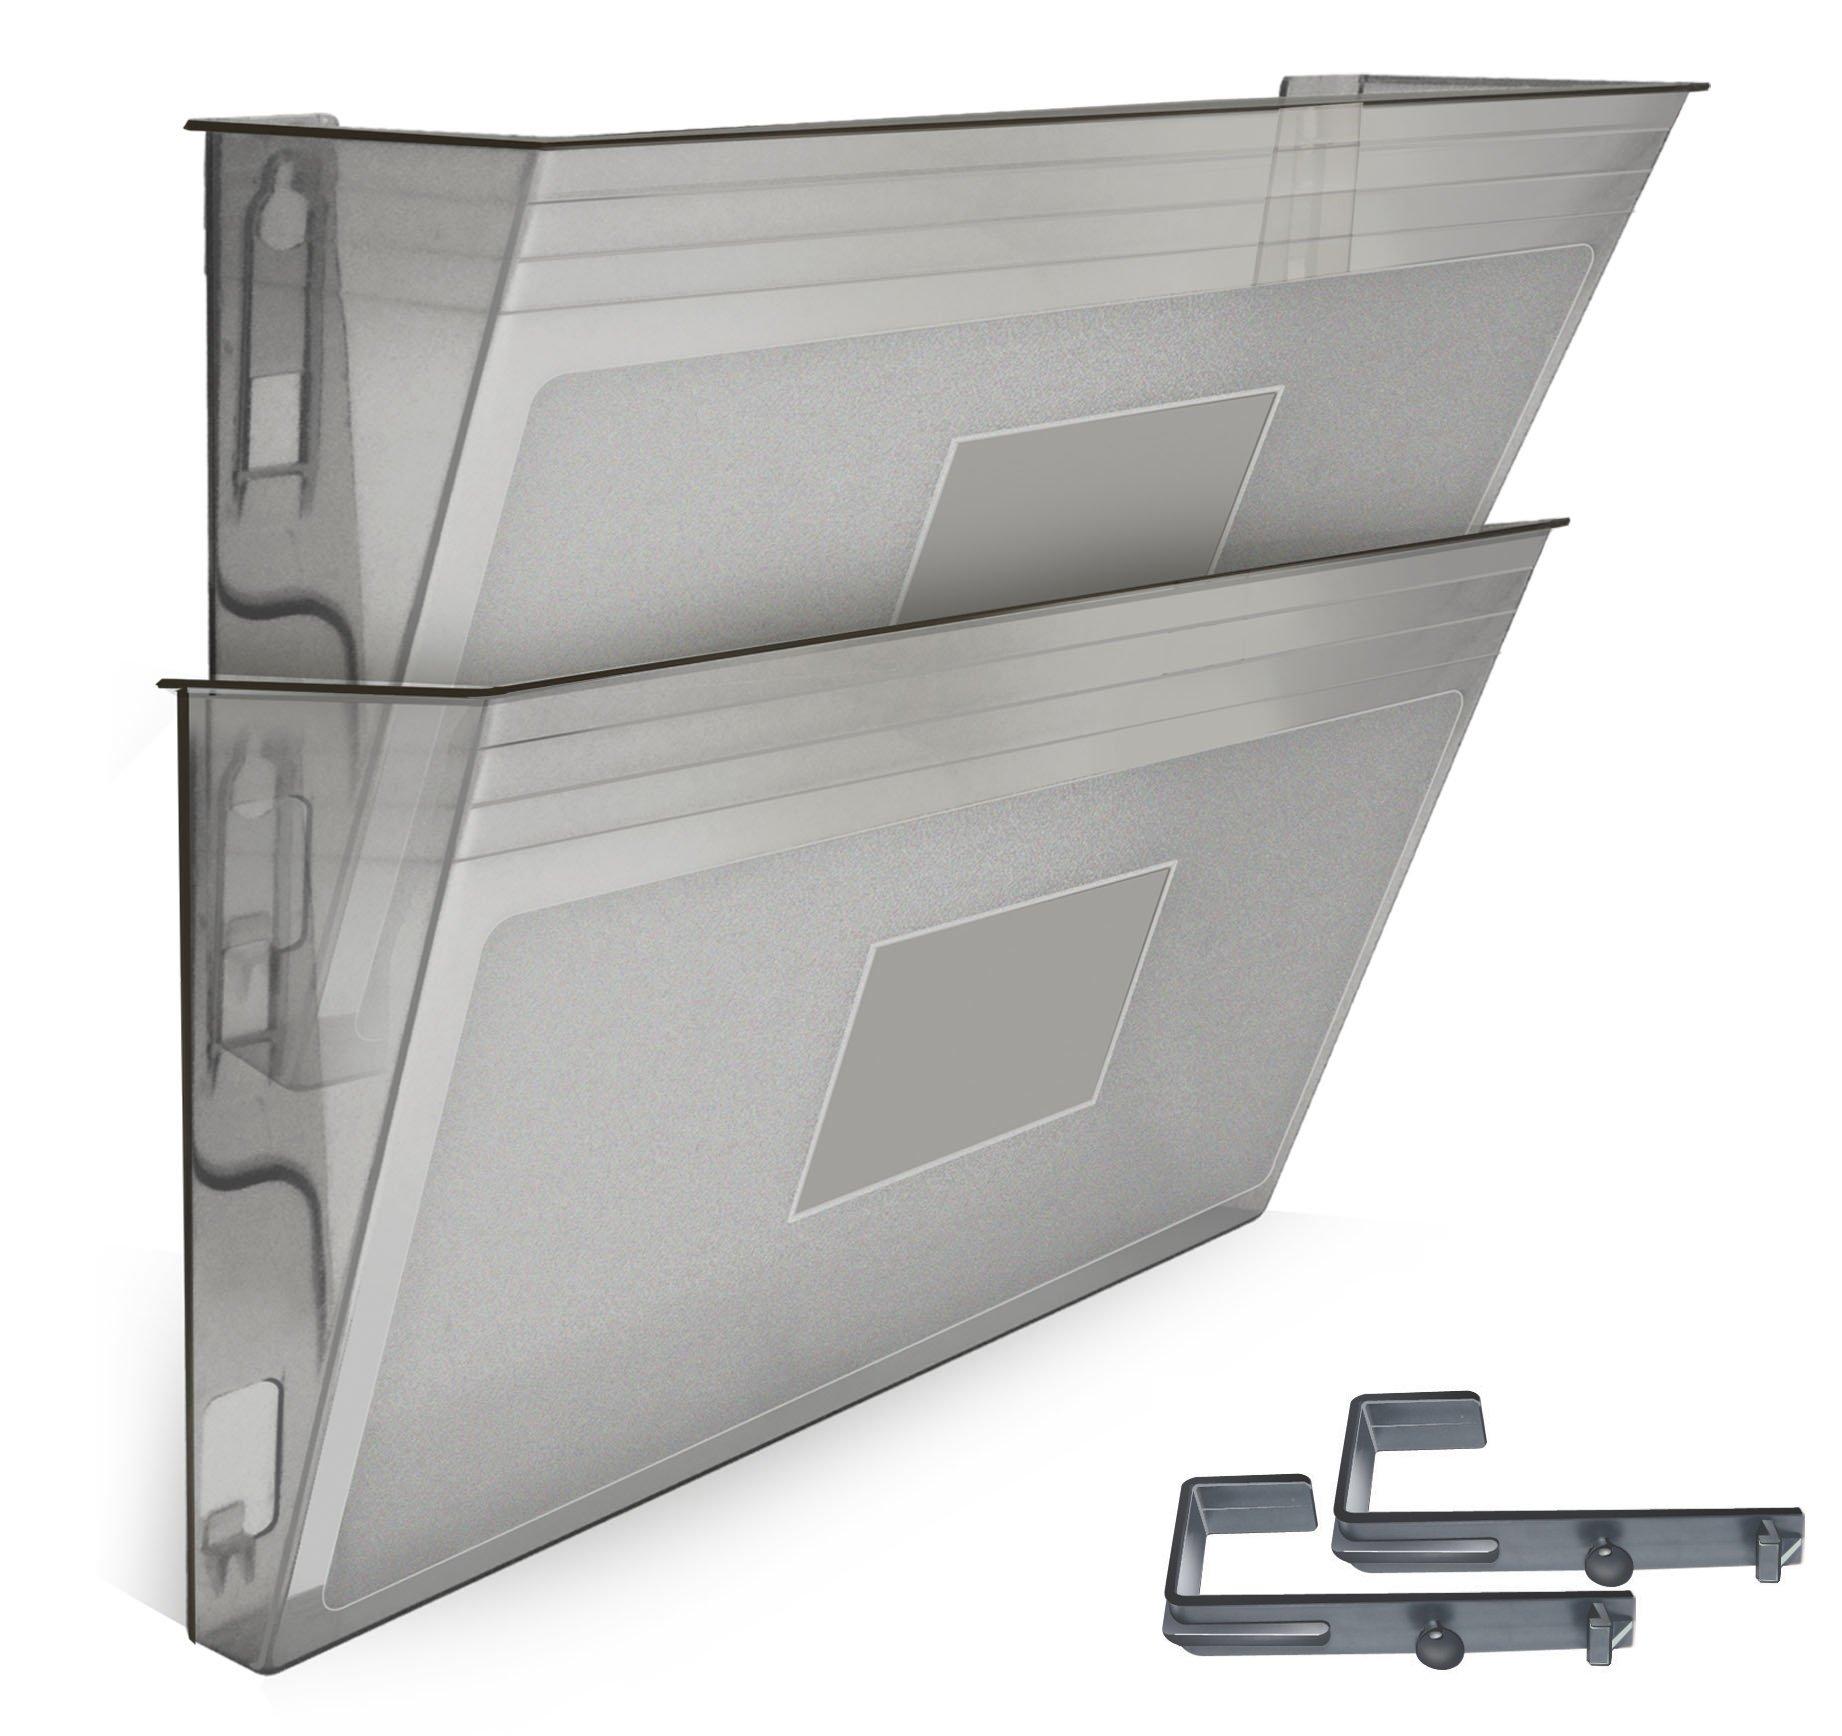 Acrimet Wall-mounted Modular File Holder (2 - Pack) (Smoke Color)